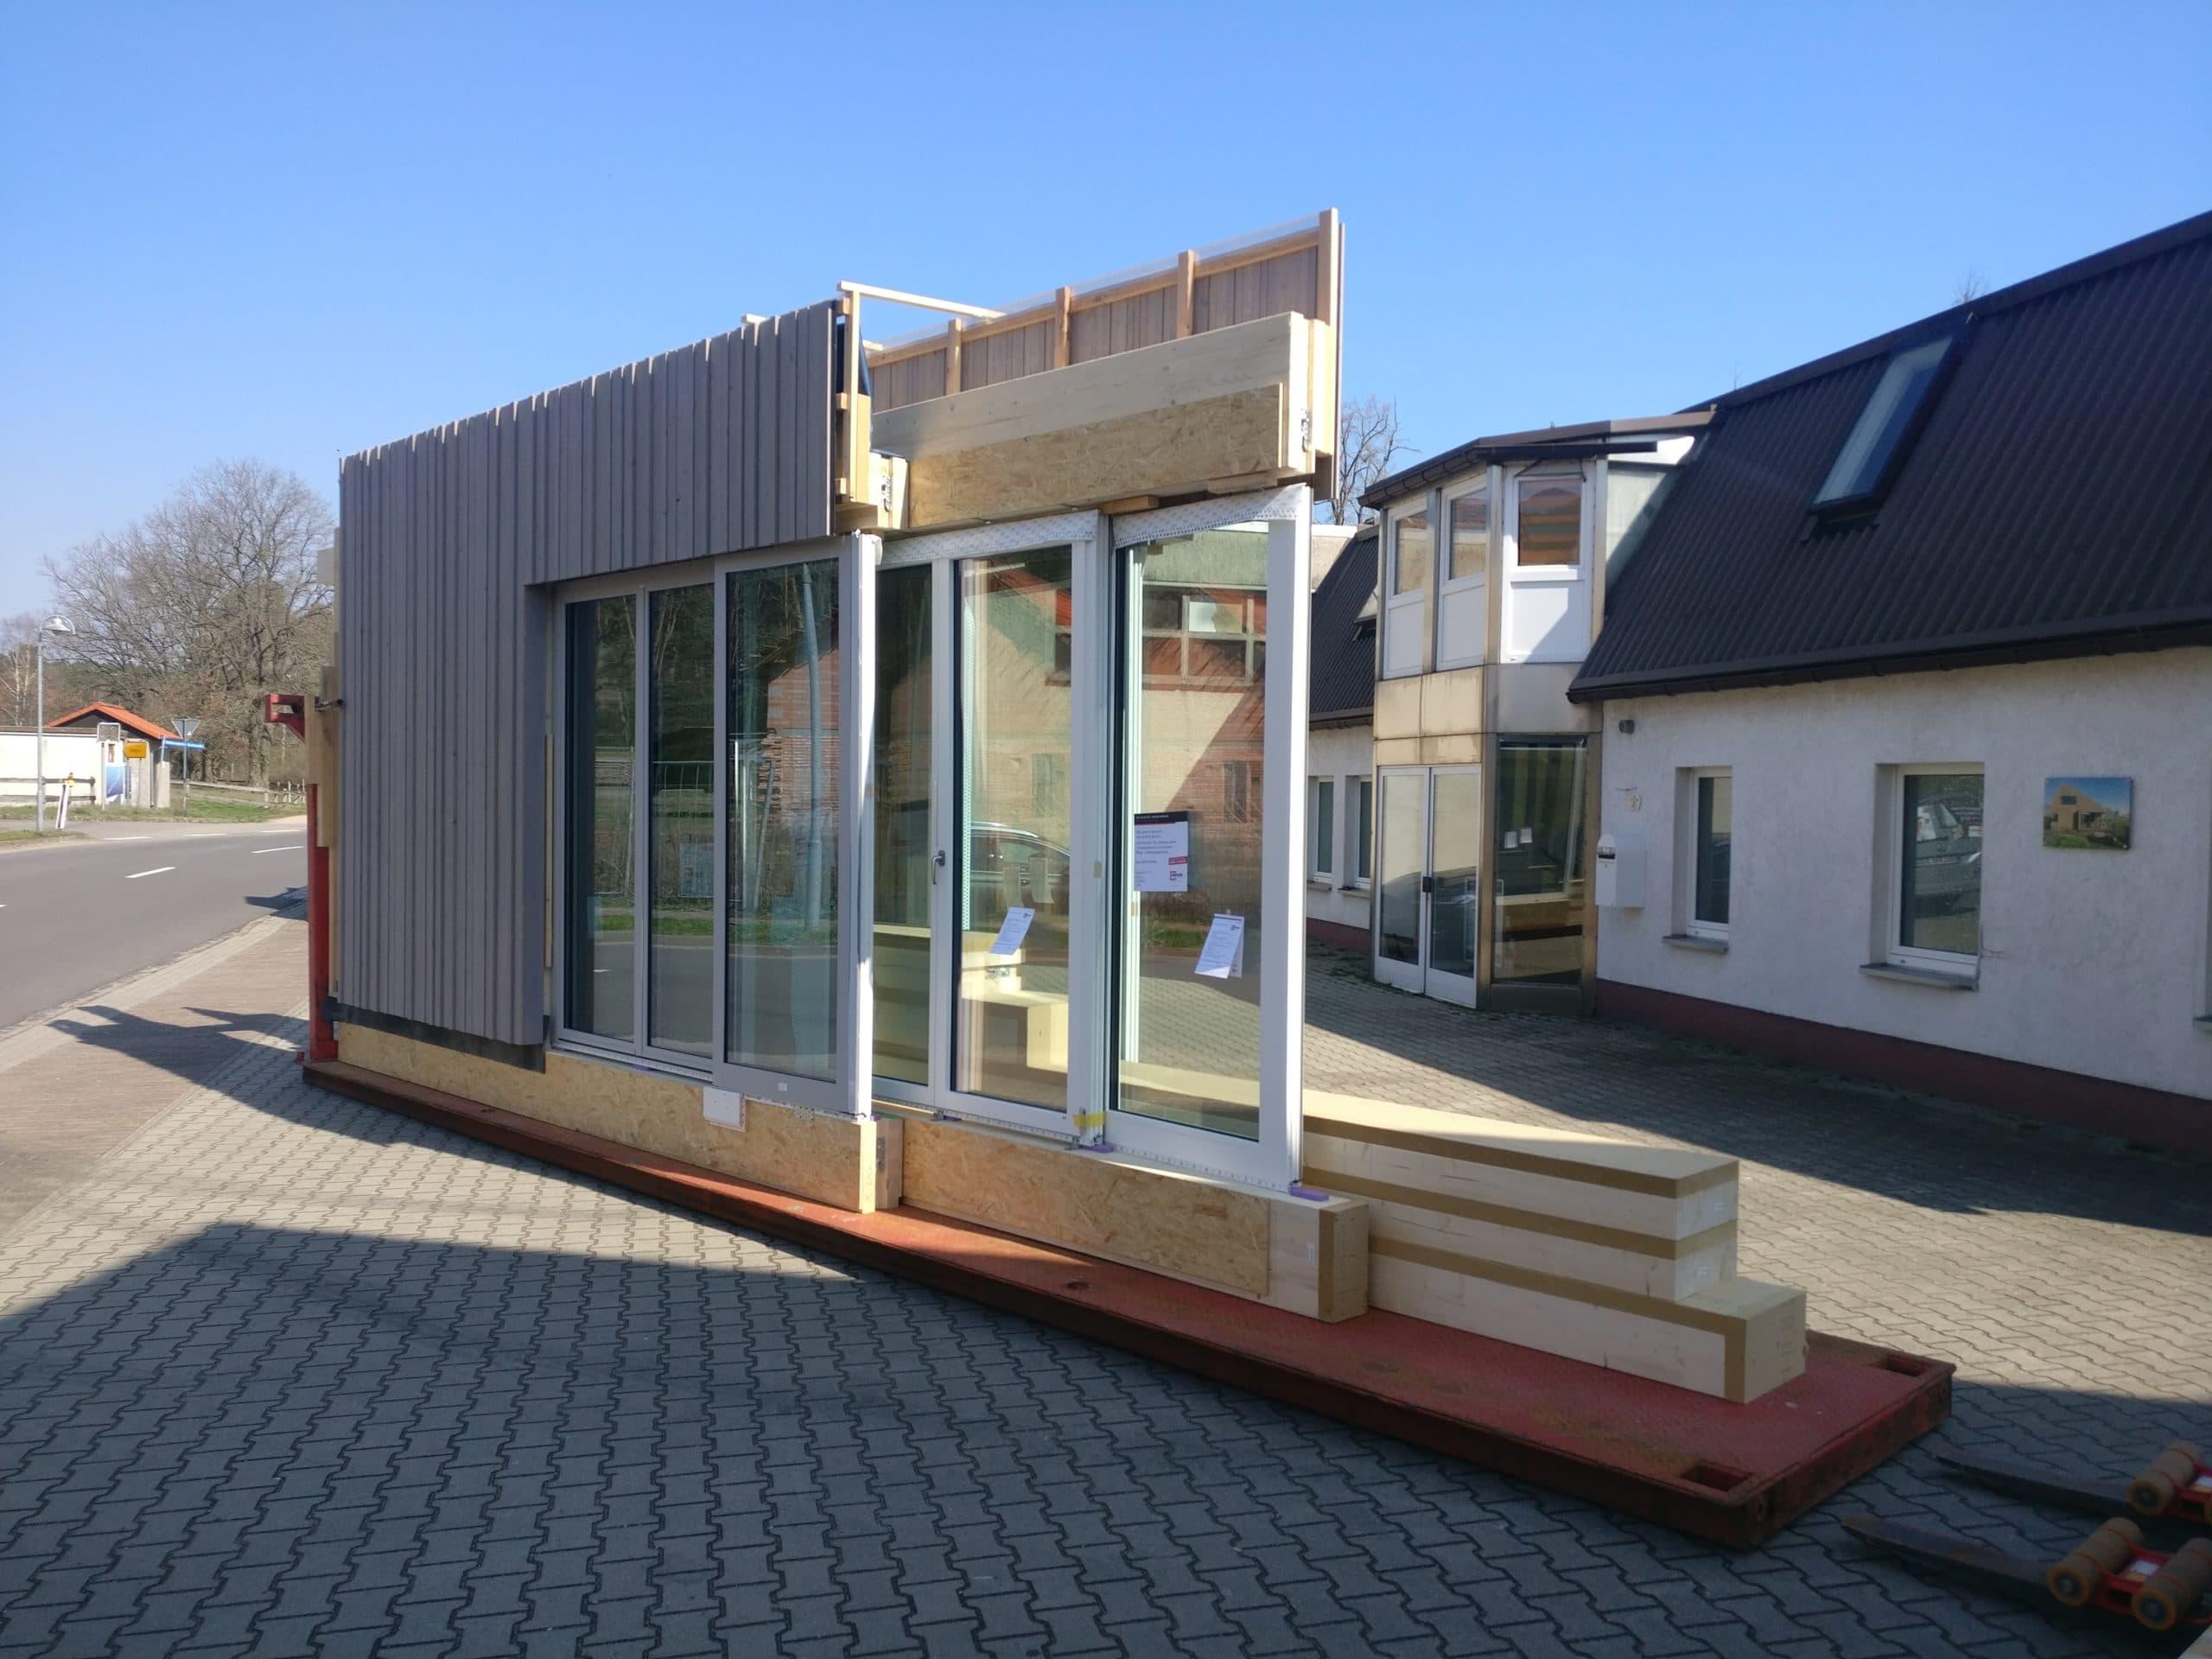 Kreuzberger Kinderstiftung Neubau Fassadenelement mit Fenster